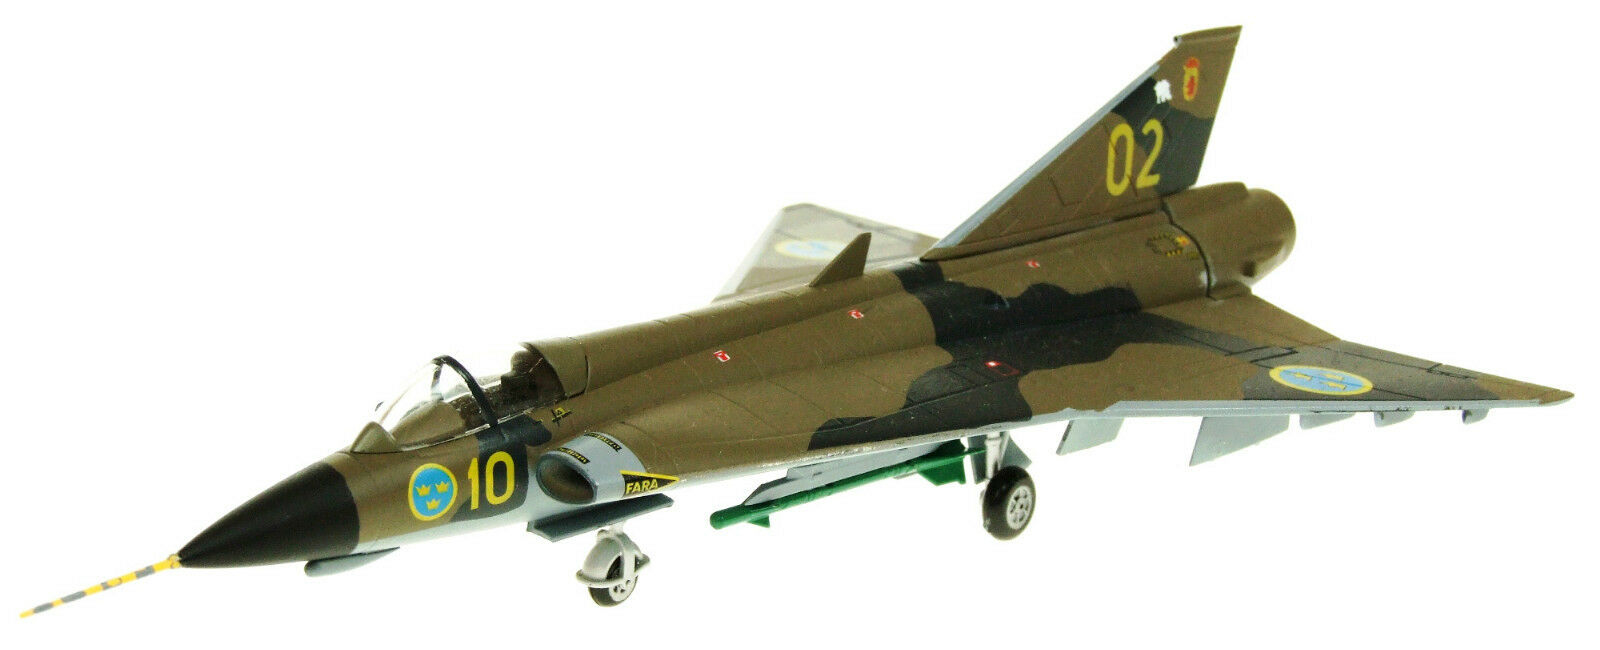 Aviation72 Av7241002 1 72 Saab Draken J35j 10 02 Suédois Force Aérienne